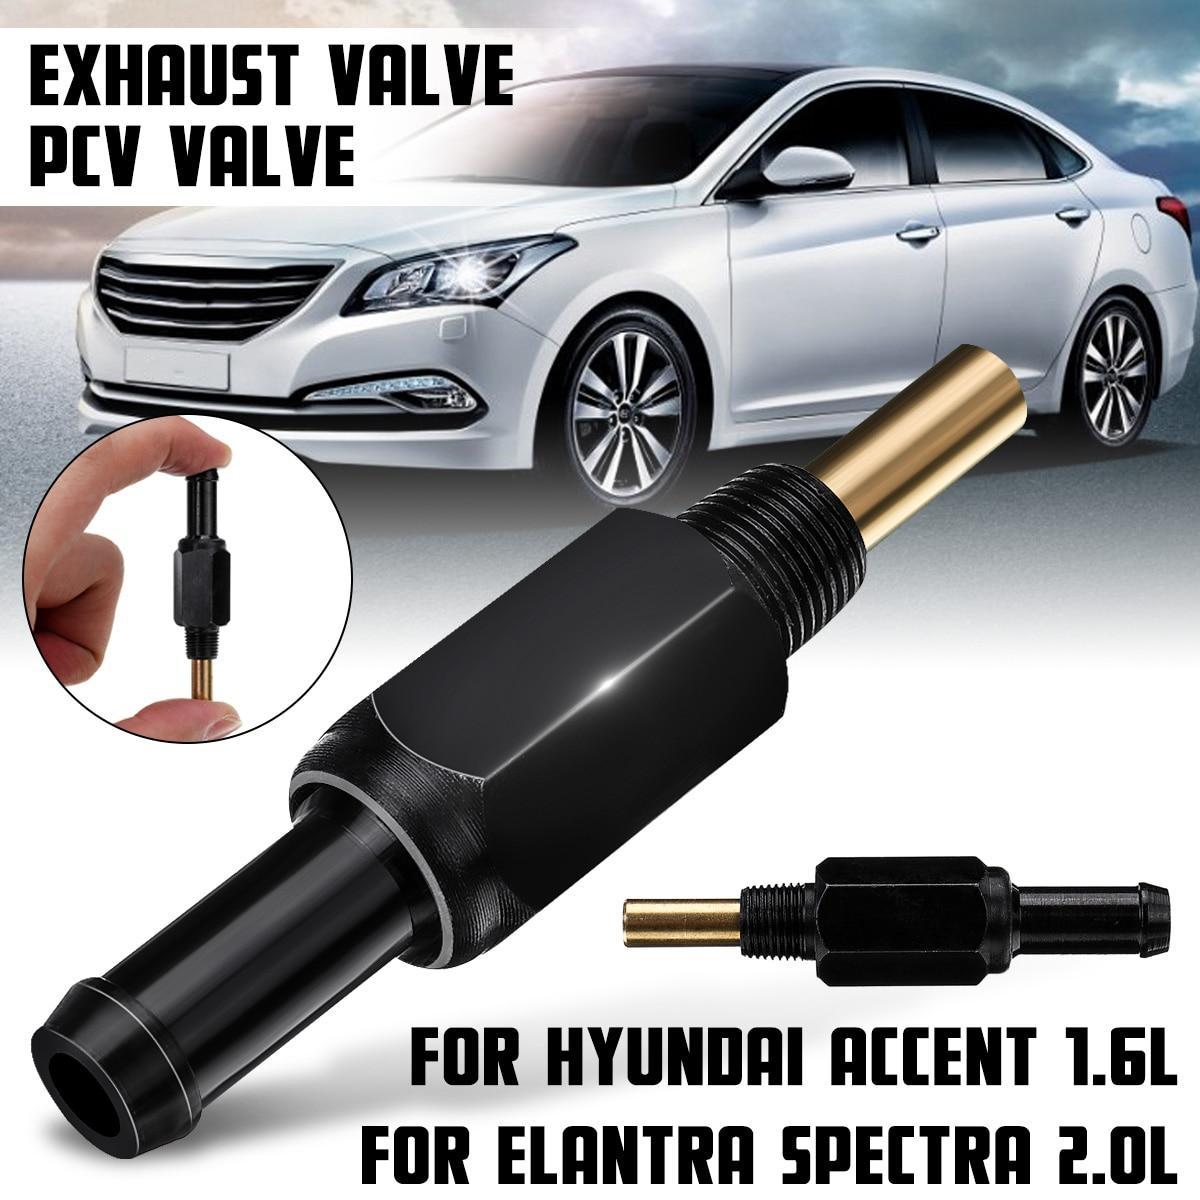 Car Exhaust Valve PCV Vent Valve 26740-21314 For Hyundai Accent 1.6L 2001 2002 2003 2004 2005 2006 2007 For Elantra Spectra 2.0L